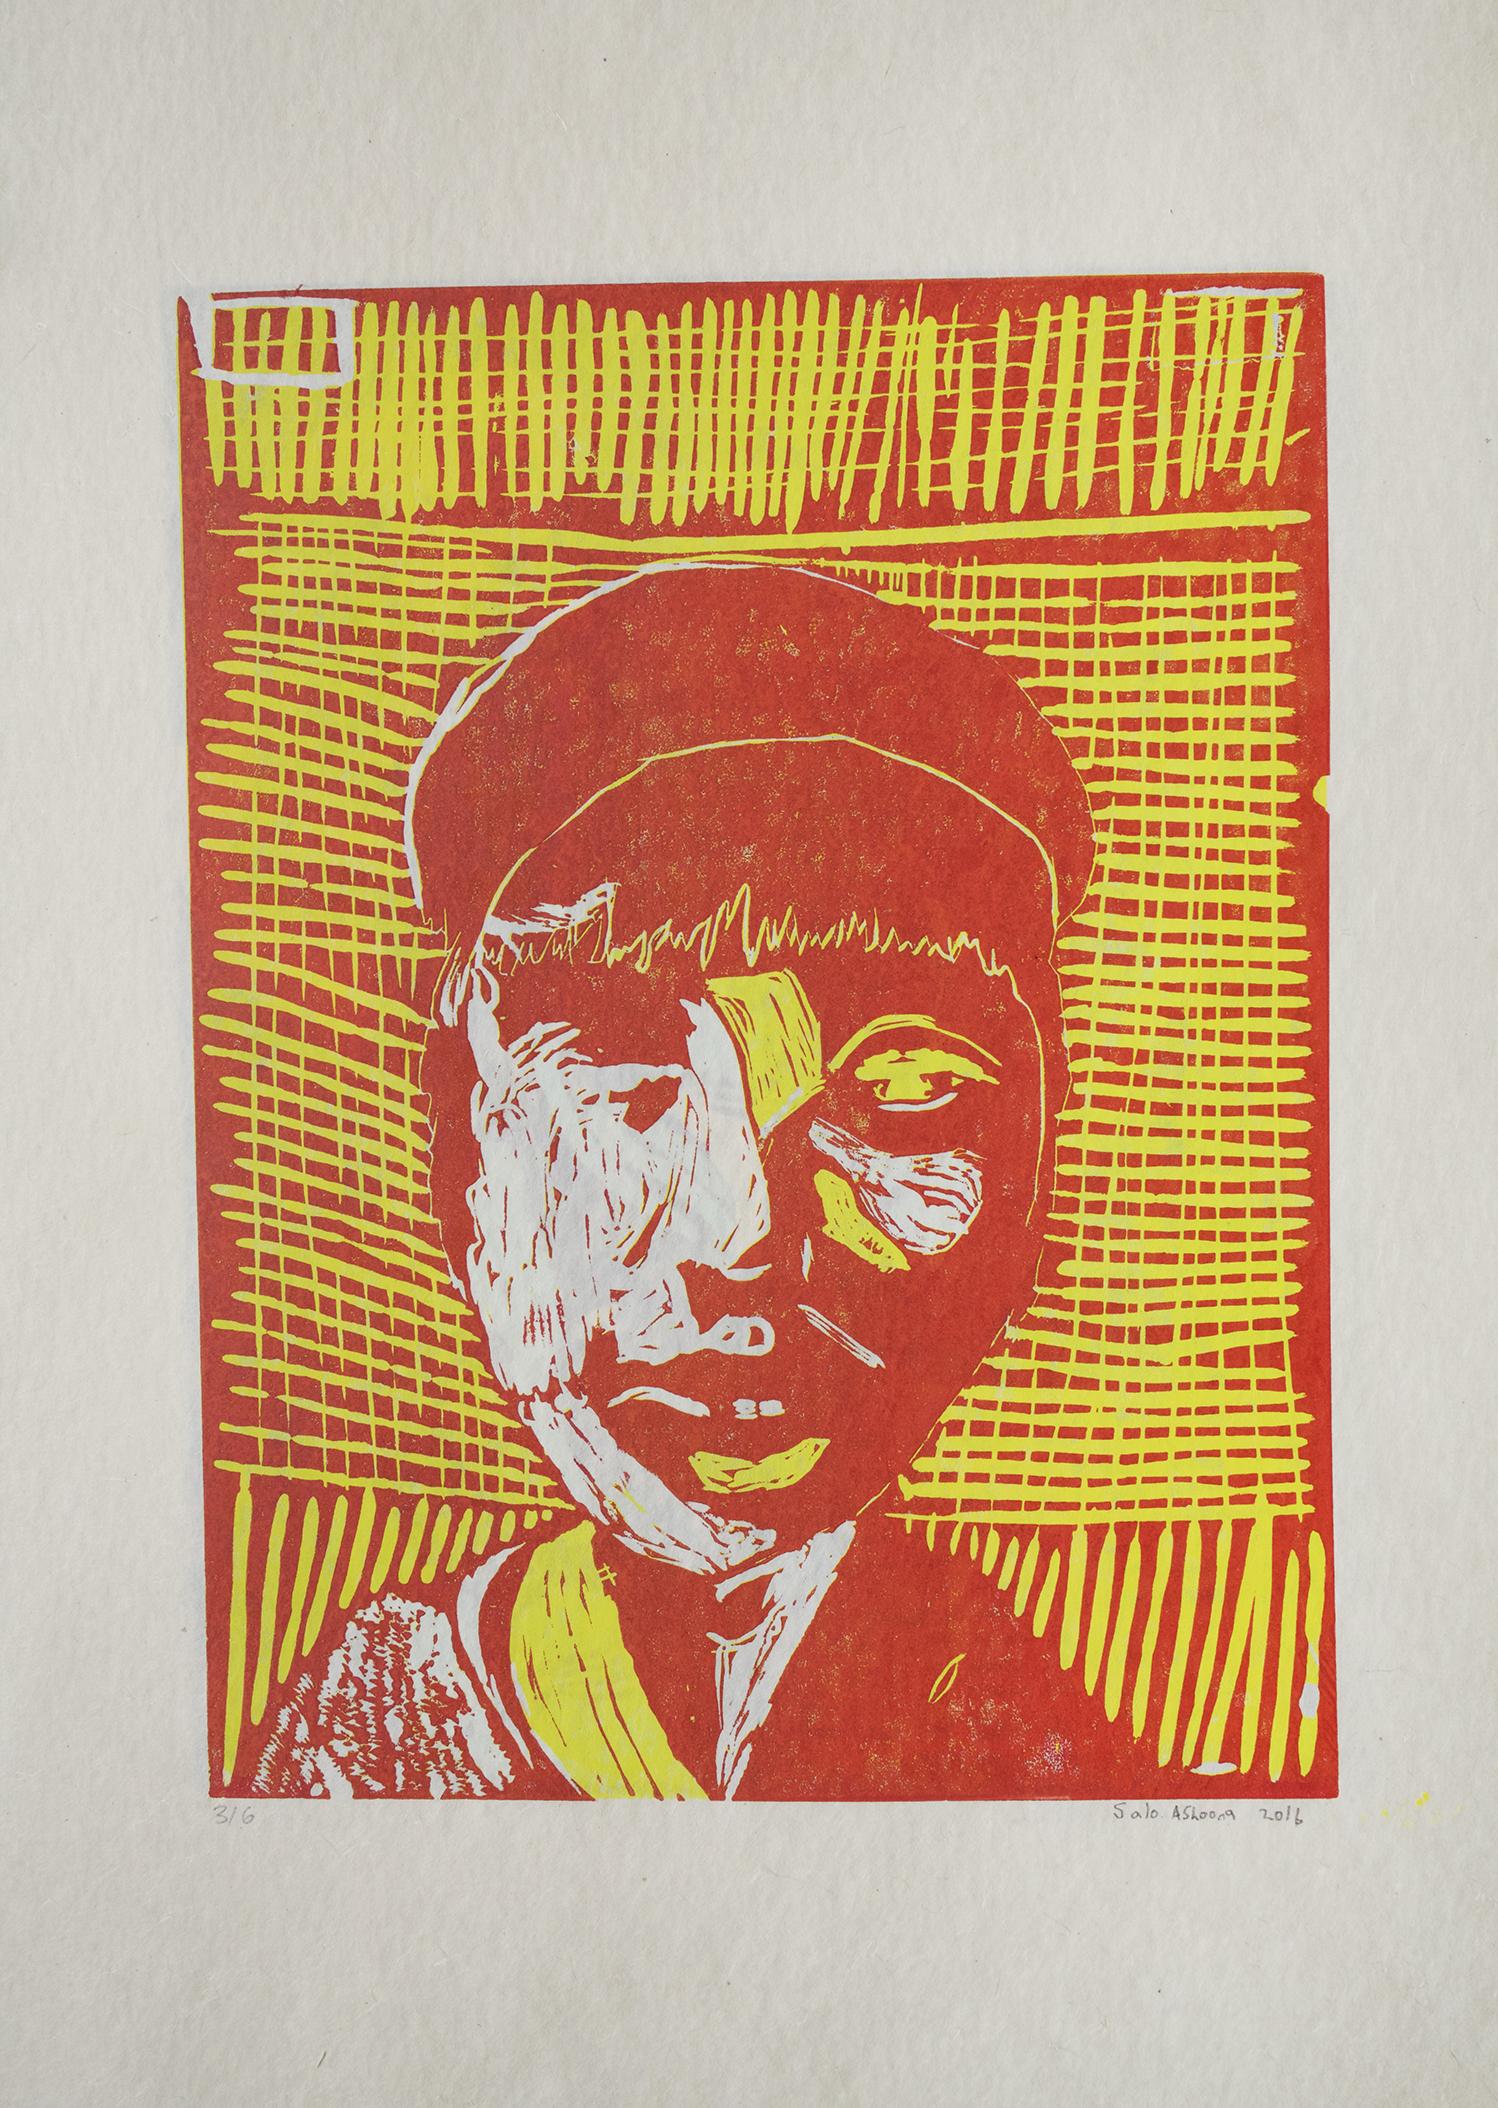 "Uvanga: Self-Portrait   Salomonie Ashoona  Two-Layer Linocut Print on Washi  15.5 x 21.5"""